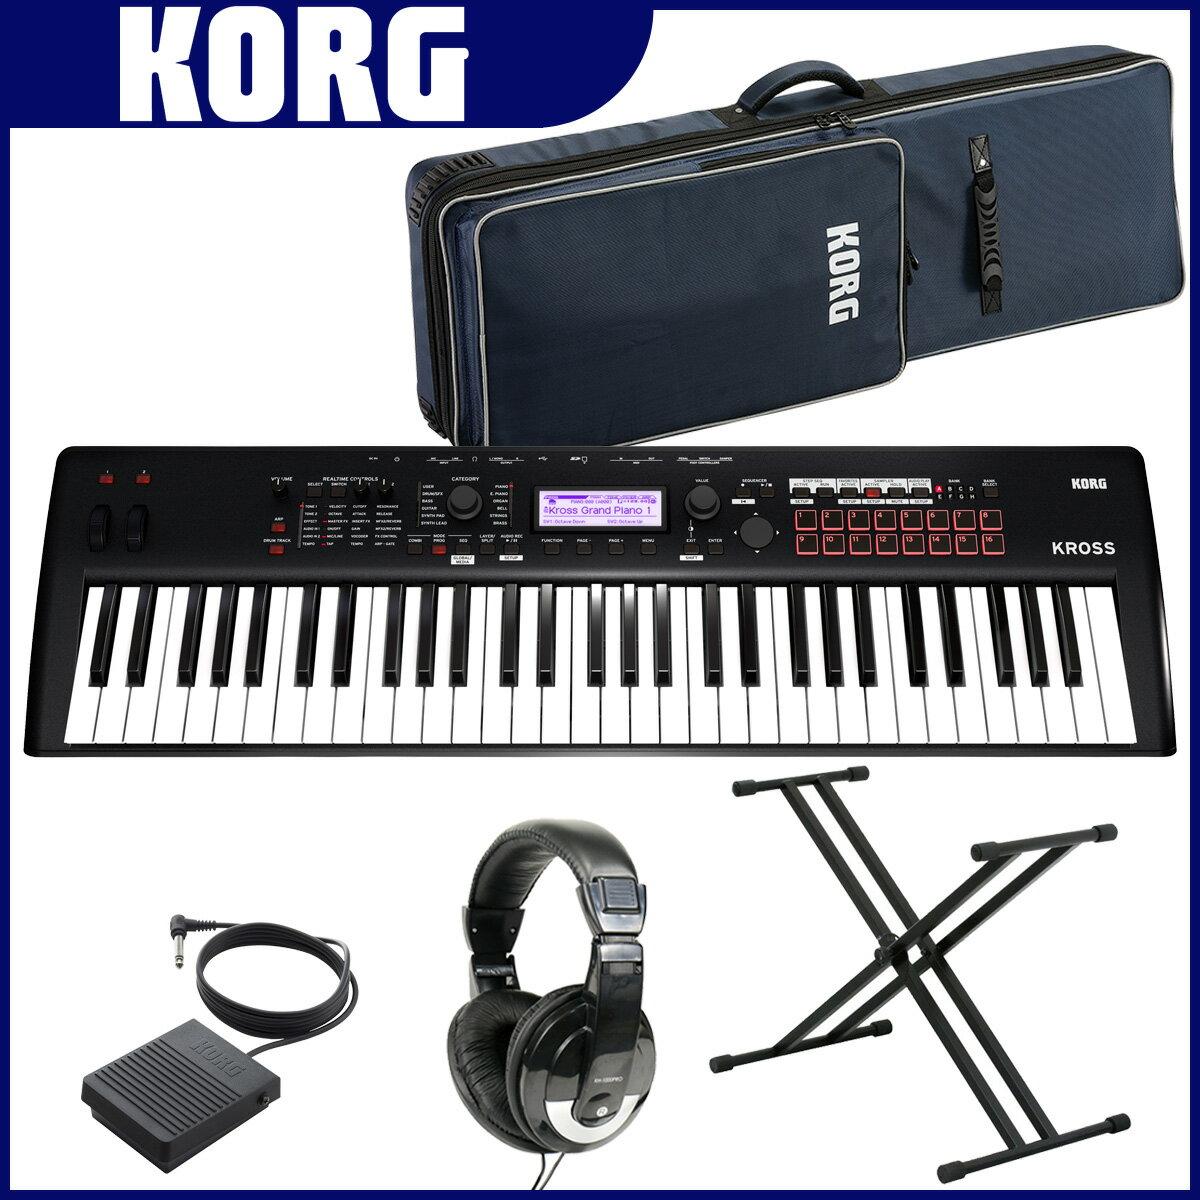 KORG コルグ / KROSS2-61 MB マットブラック【オプションセット!】【YRK】